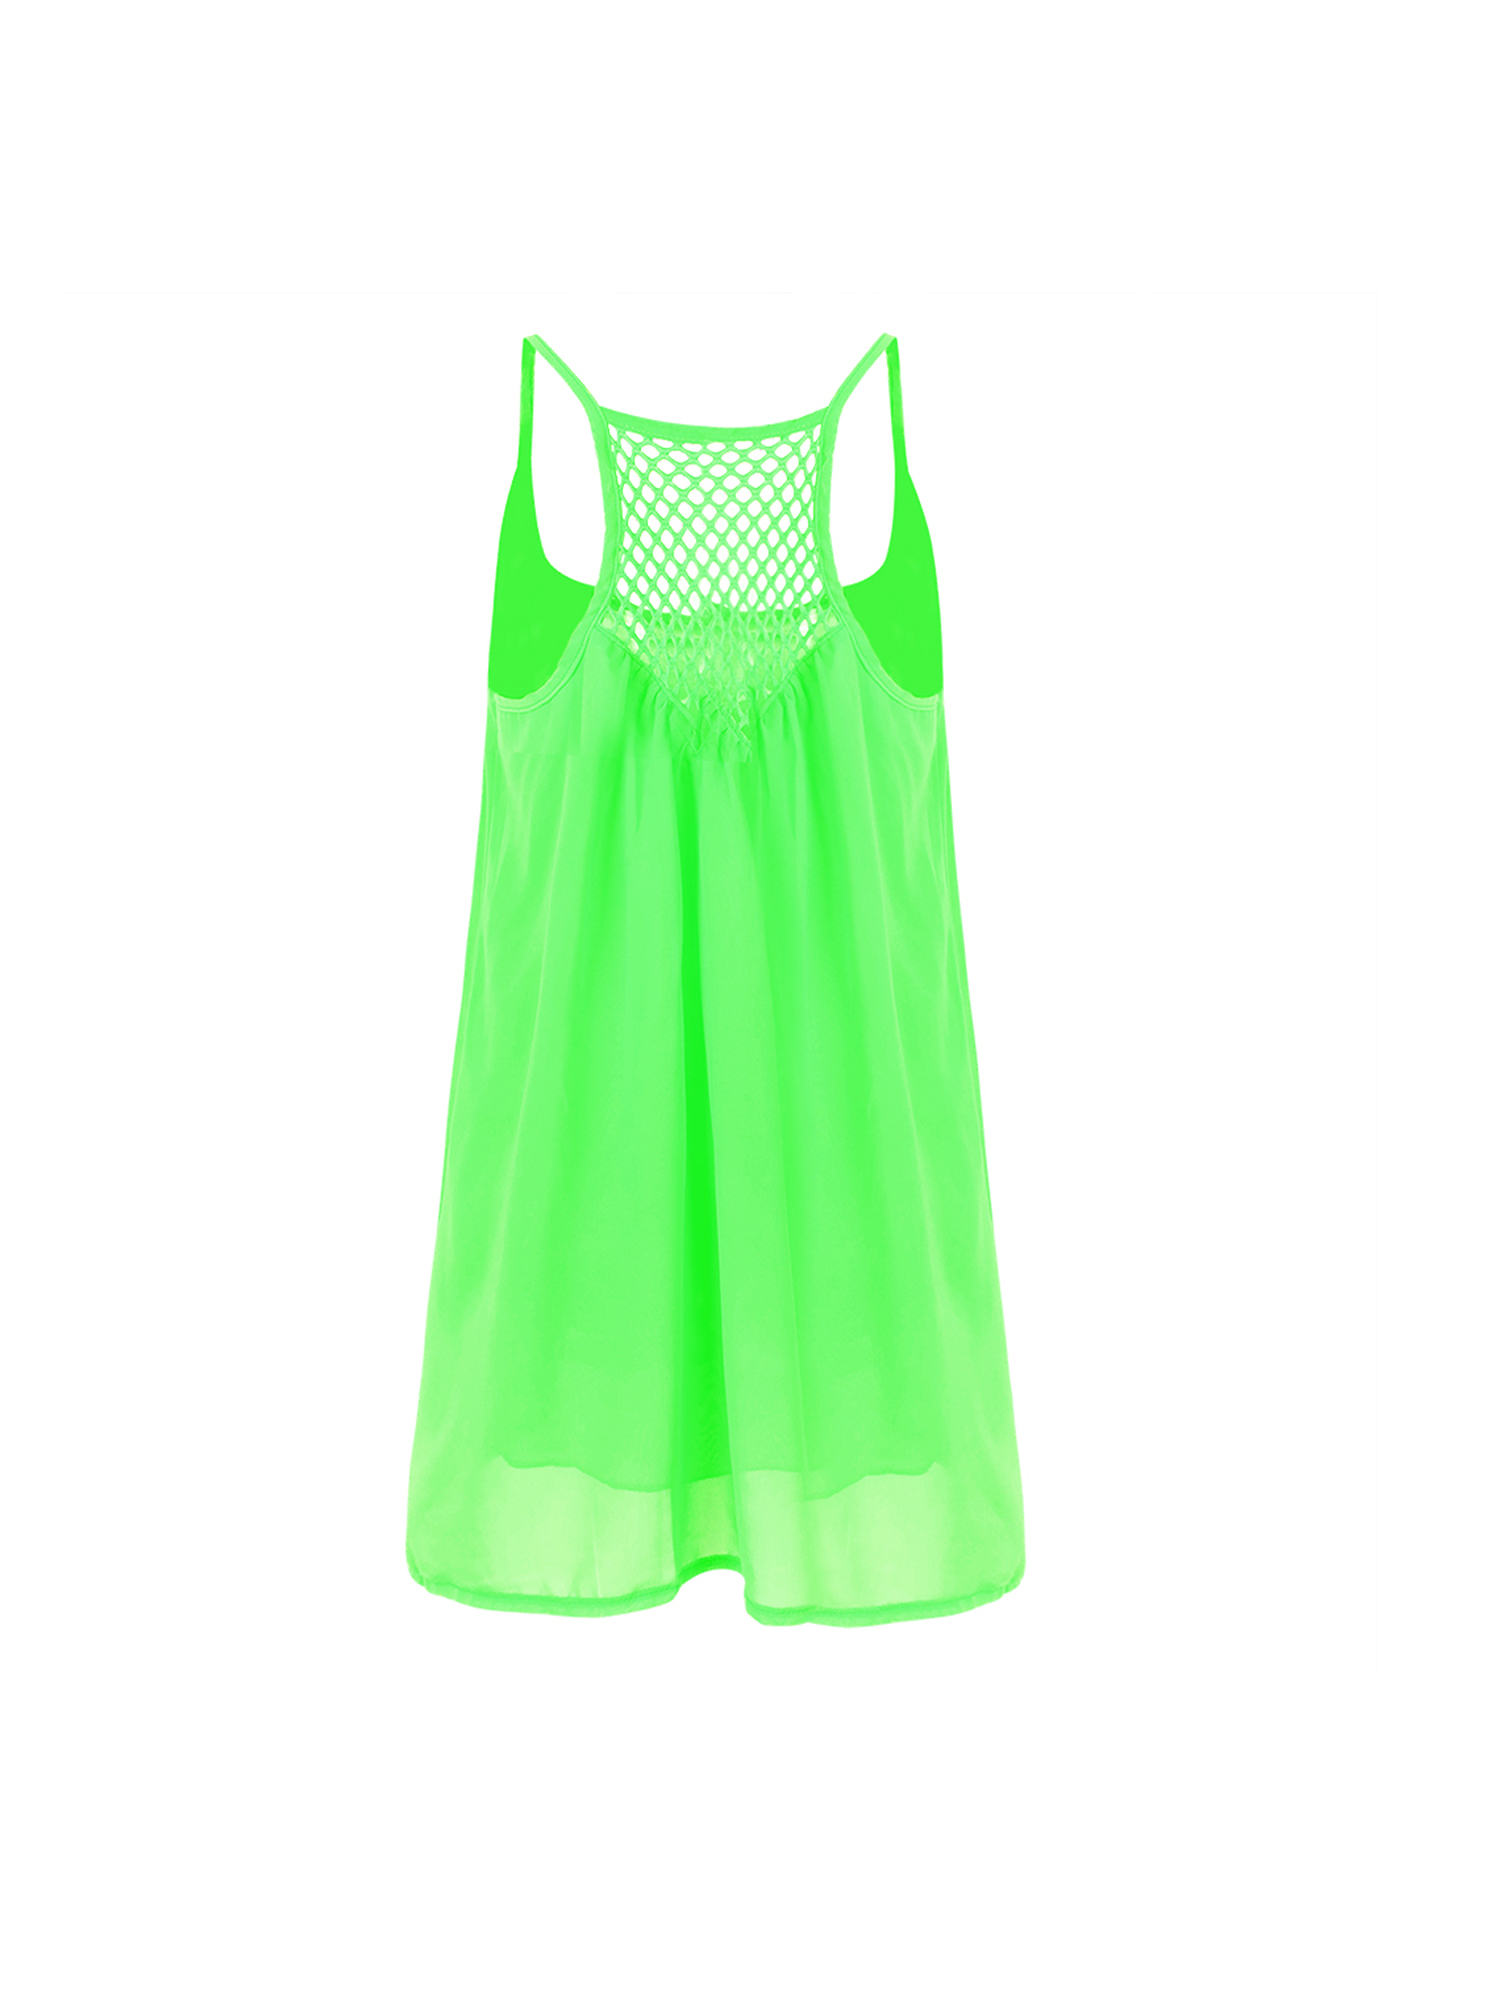 73b25a9aba Women Casual Losse Mini Dress Asymmetrical Hem Party Dresses Grid Splice  Backless Sling Sleeveless Summer Short Dresses